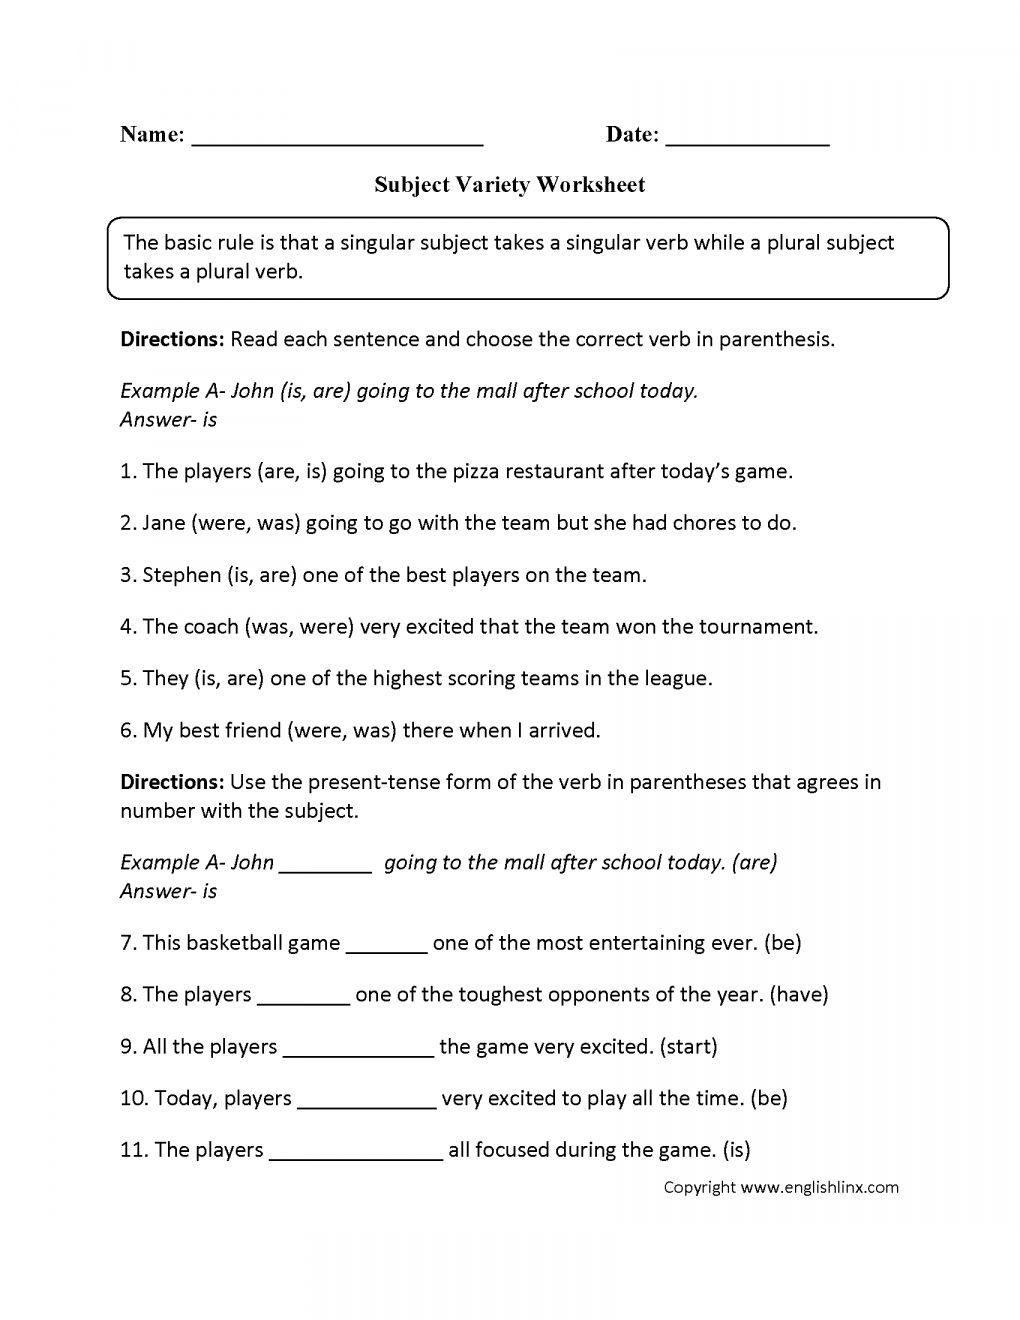 Verbs Worksheets For Grade 5 Pdf   Wallpaper Site [ 1320 x 1020 Pixel ]